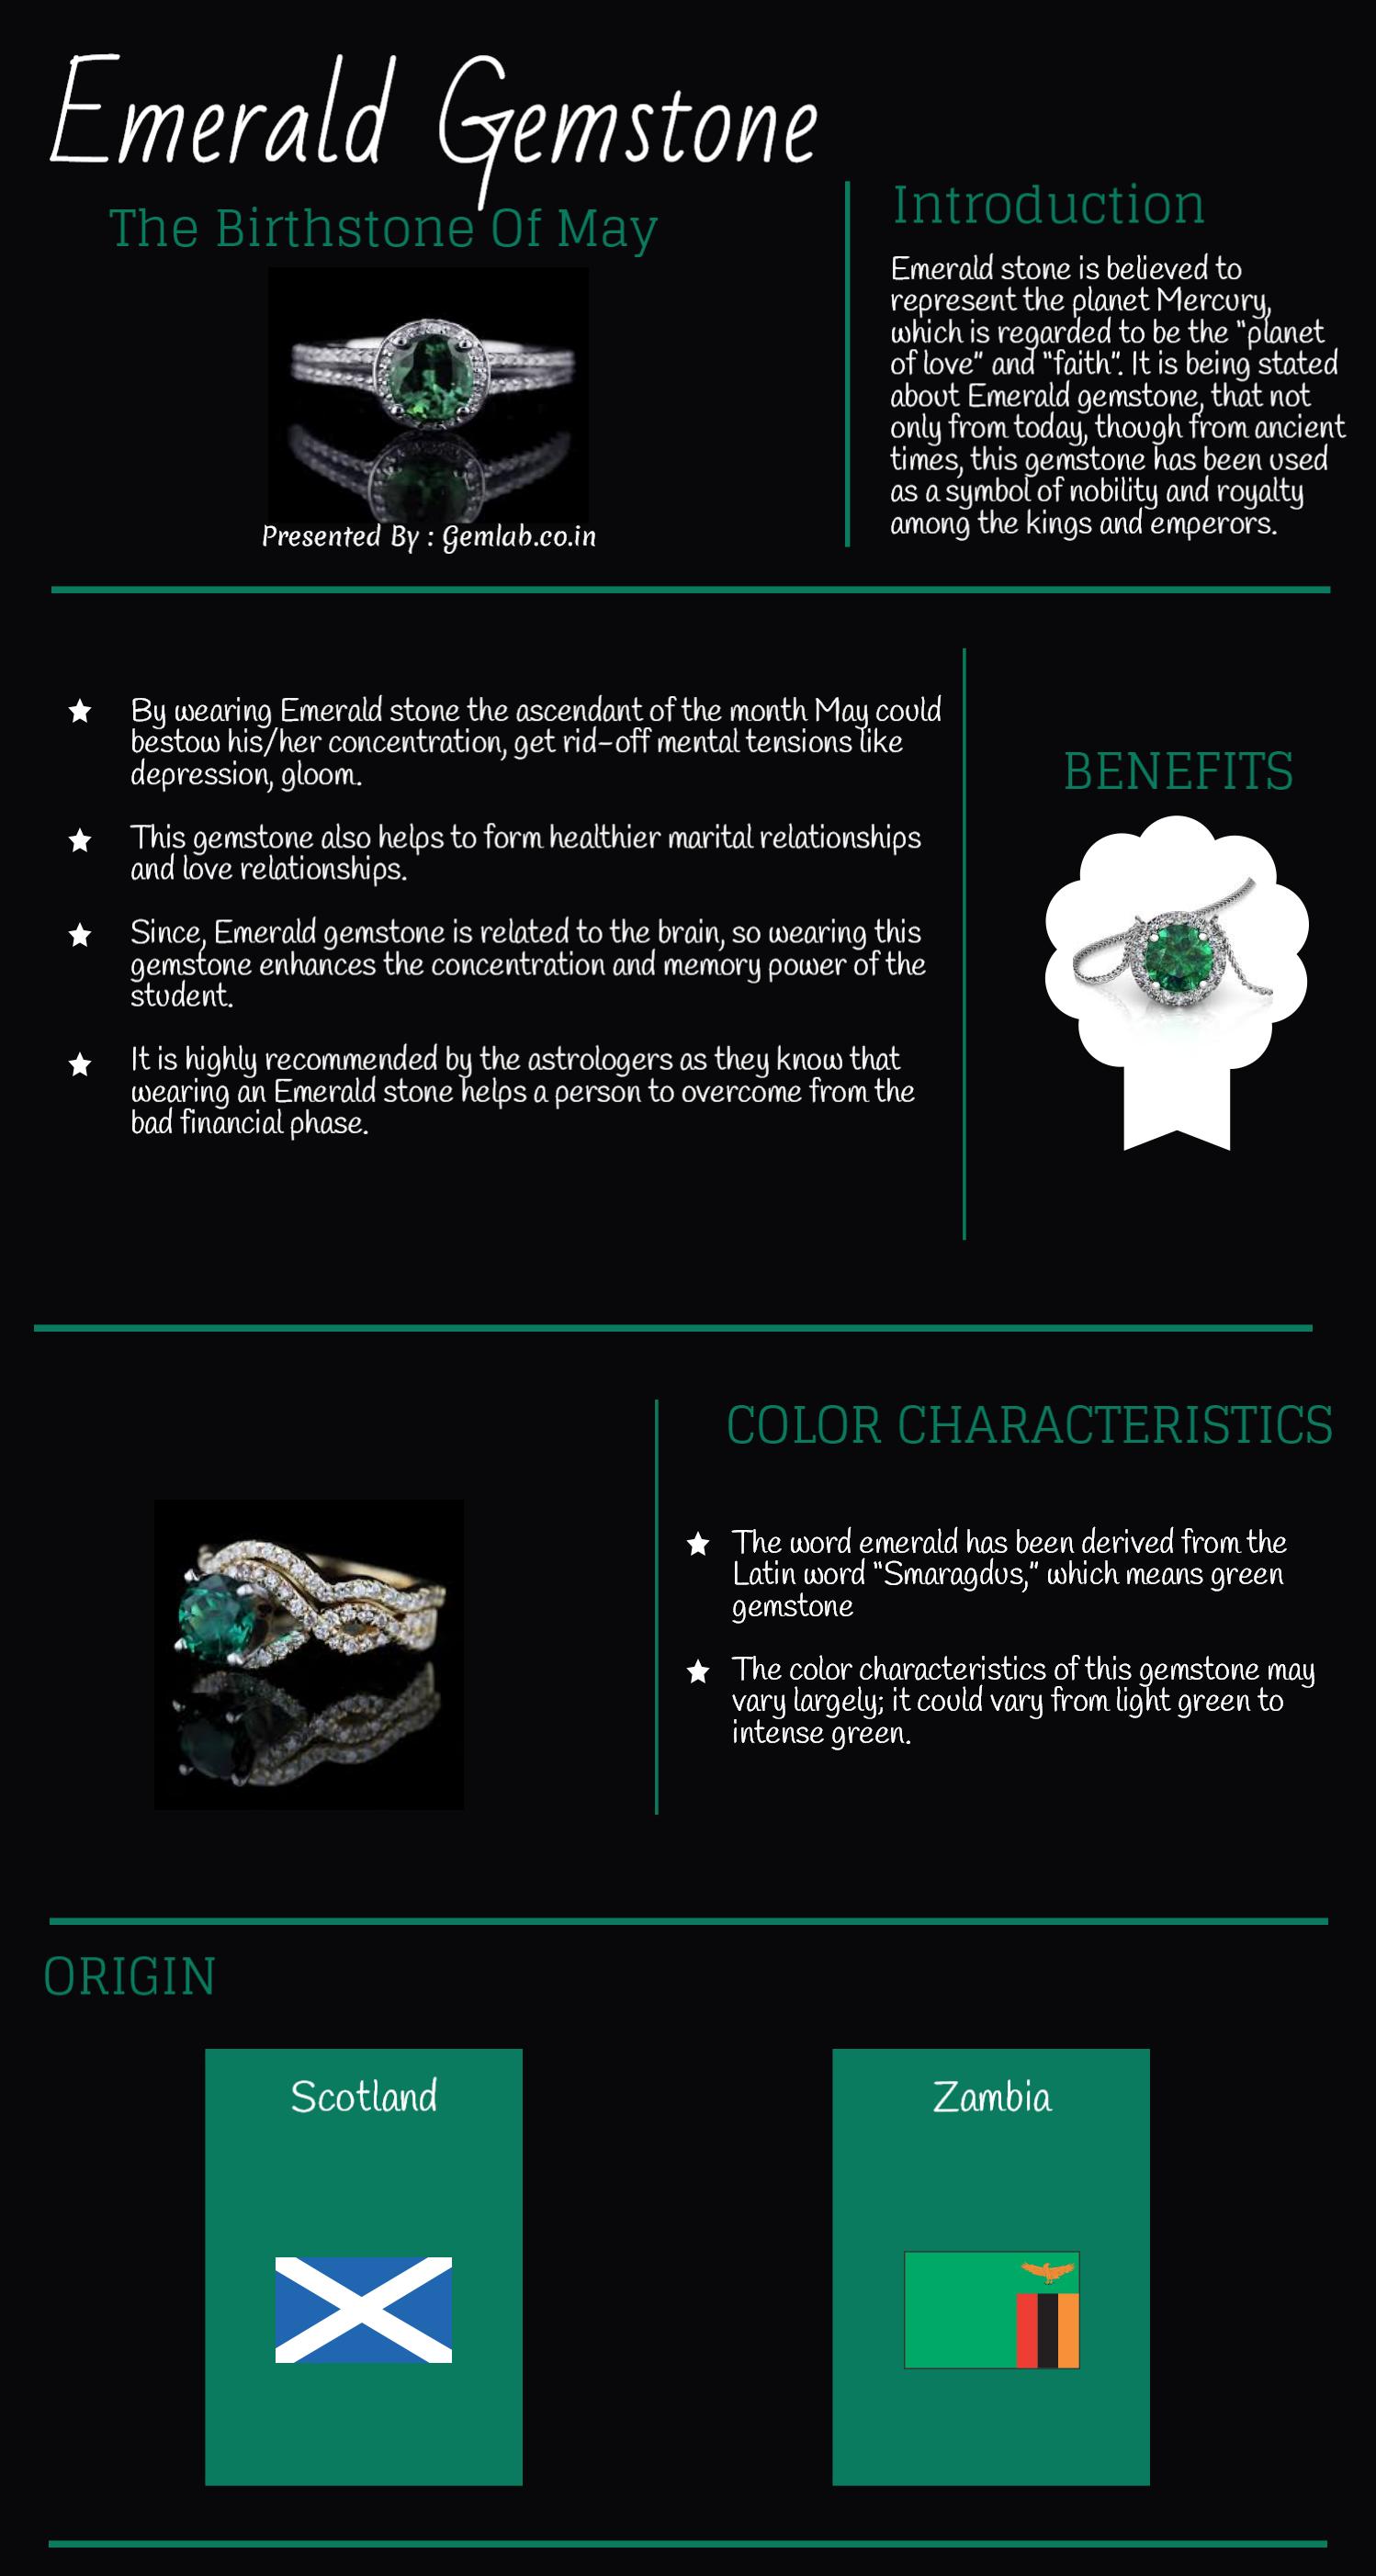 Emerald Birthstone of May